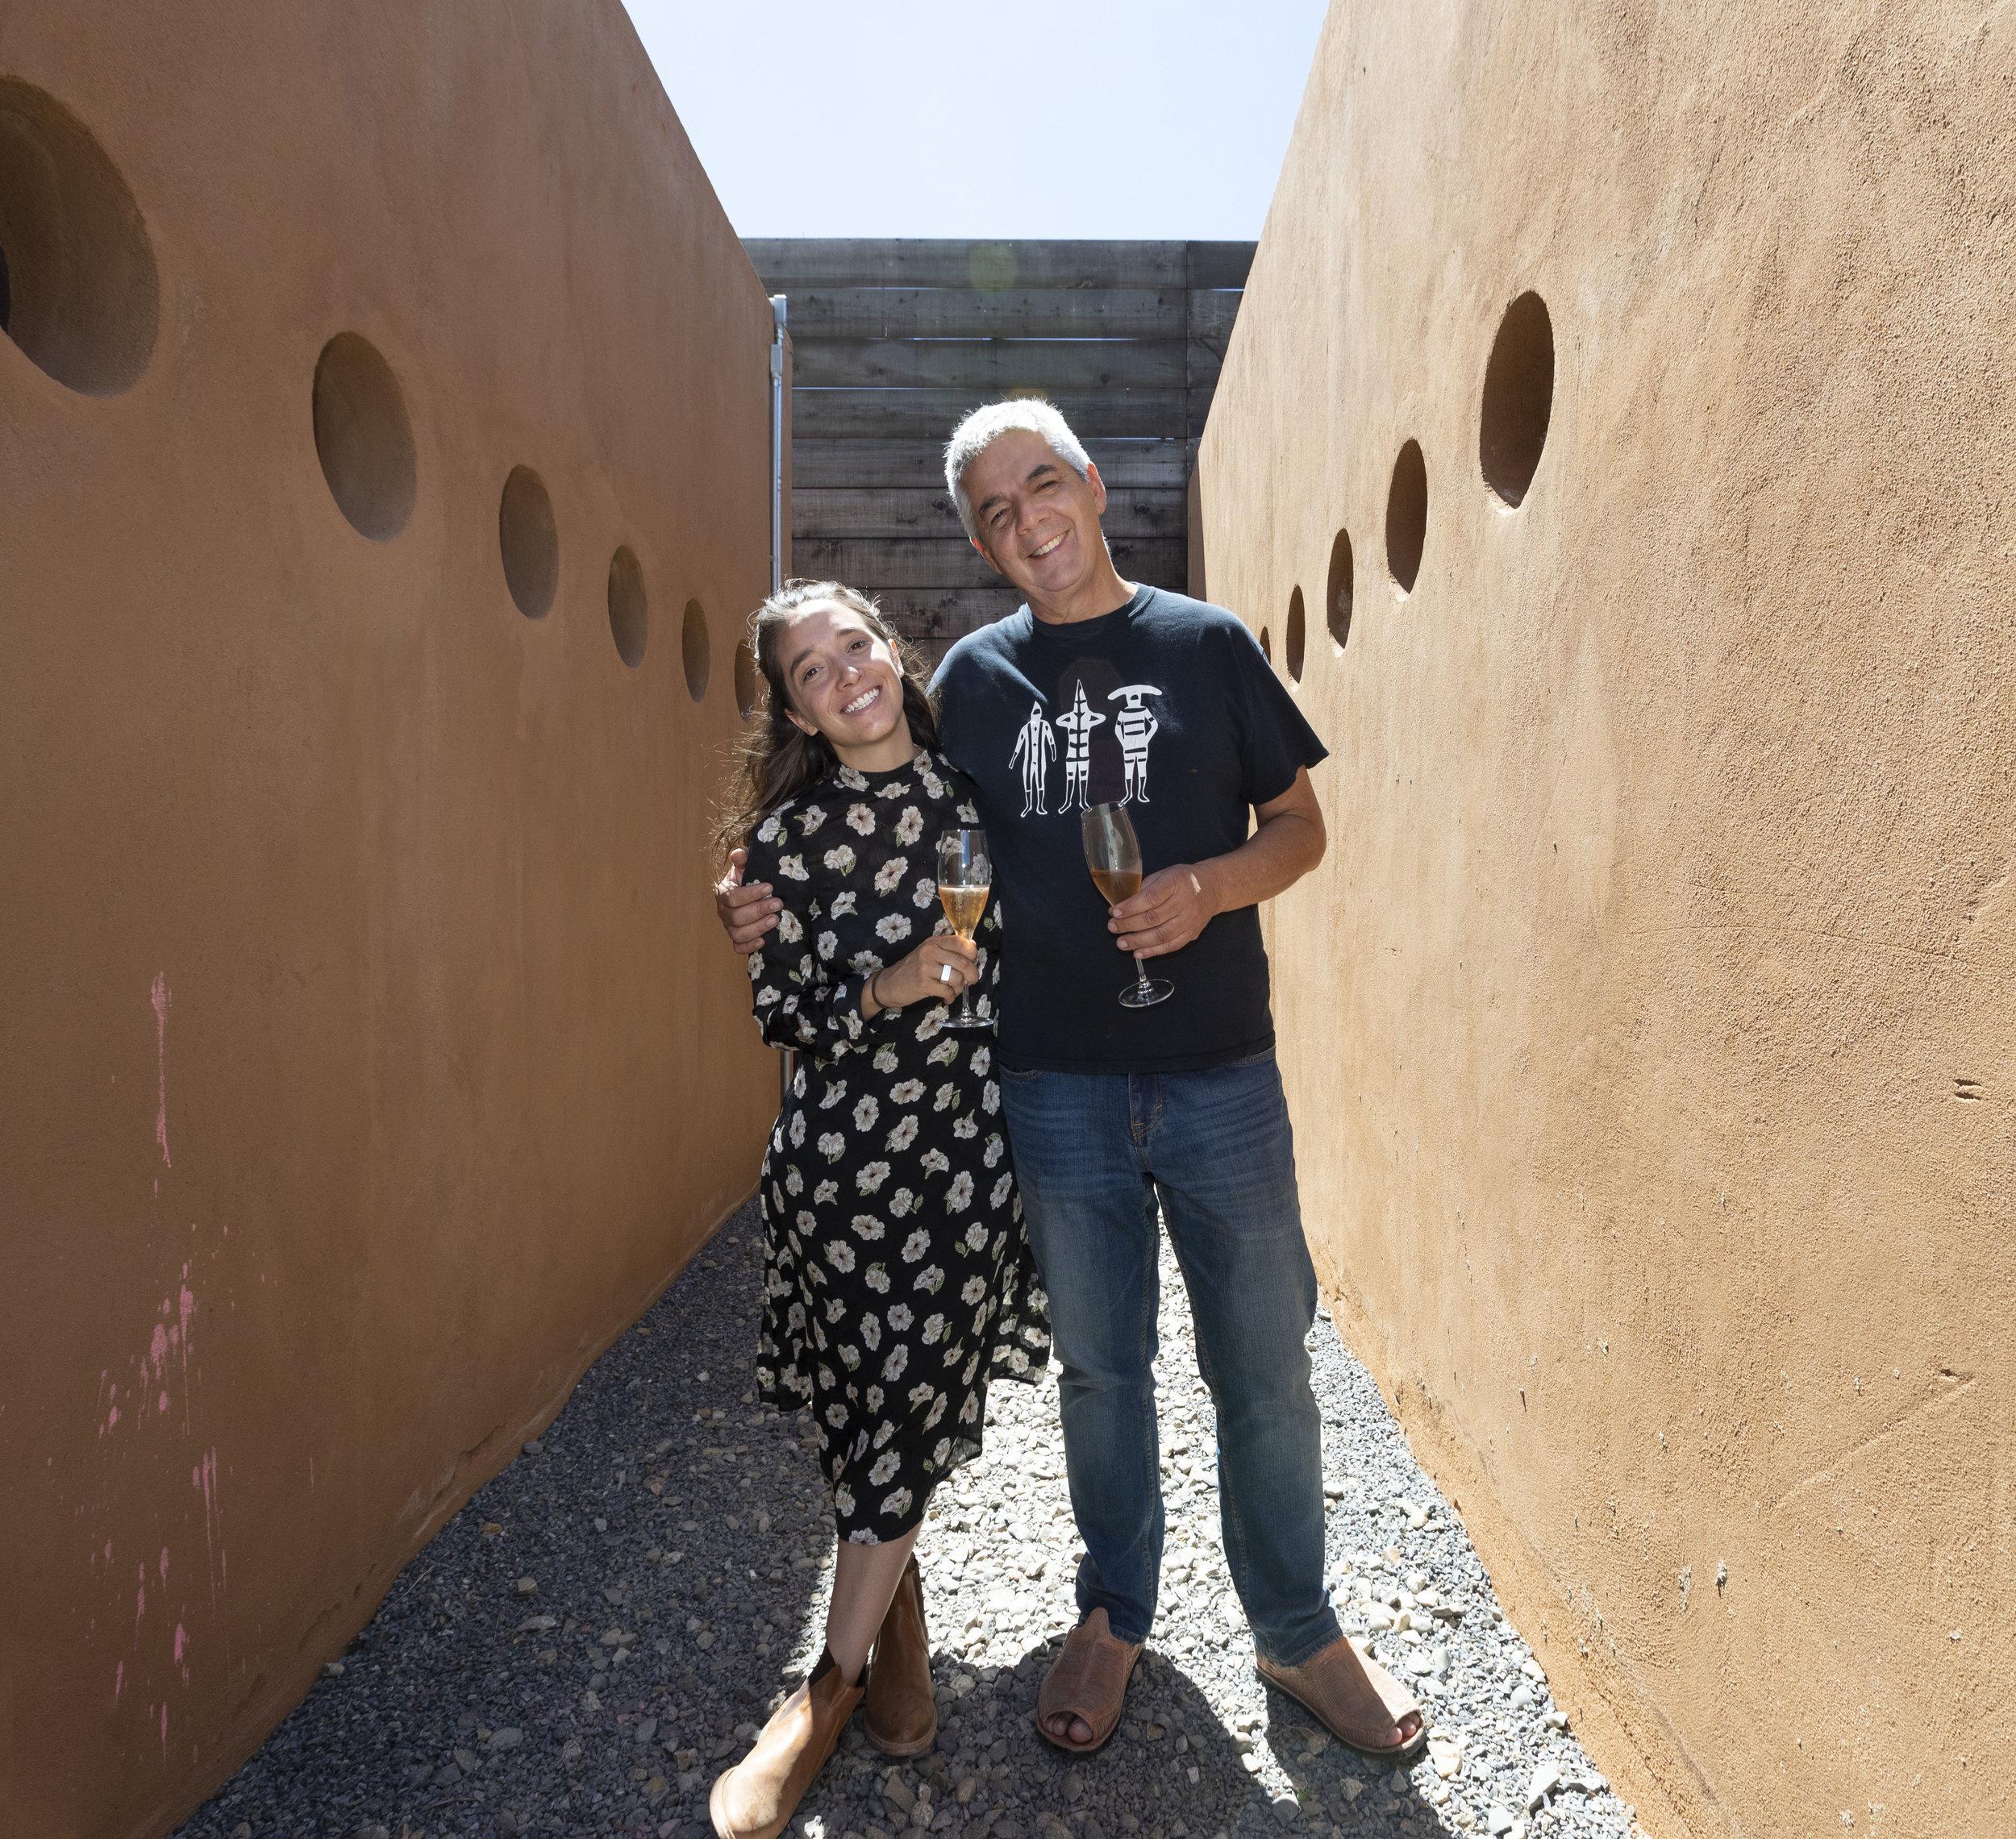 Hugo D'Acosta and Daniela D'Acosta